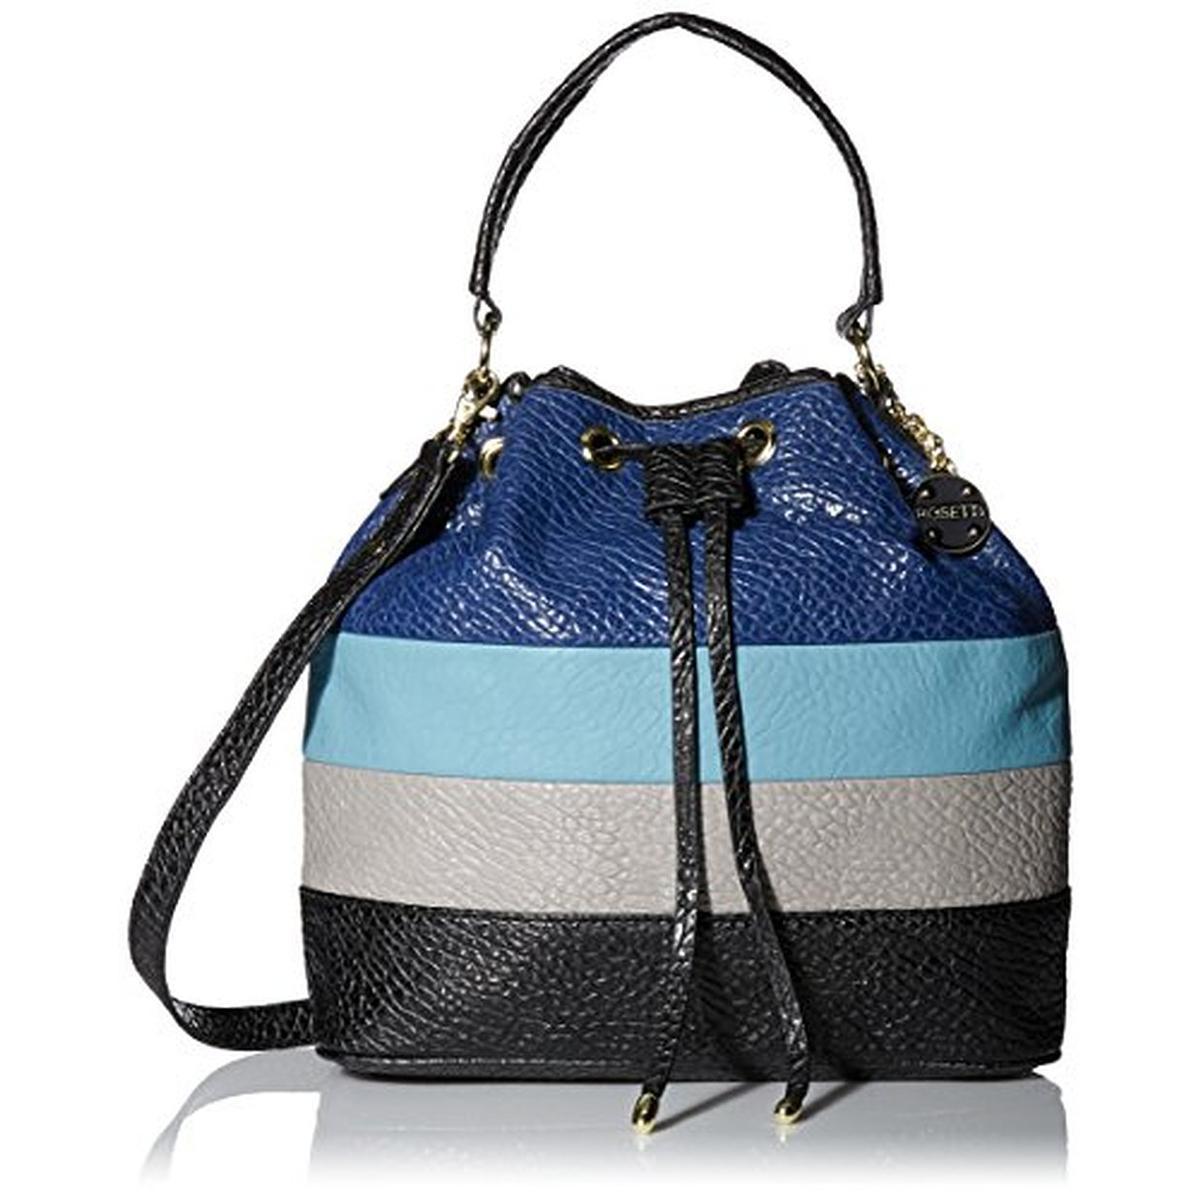 Rosetti Cassandra Faux Leather Bucket Handbag